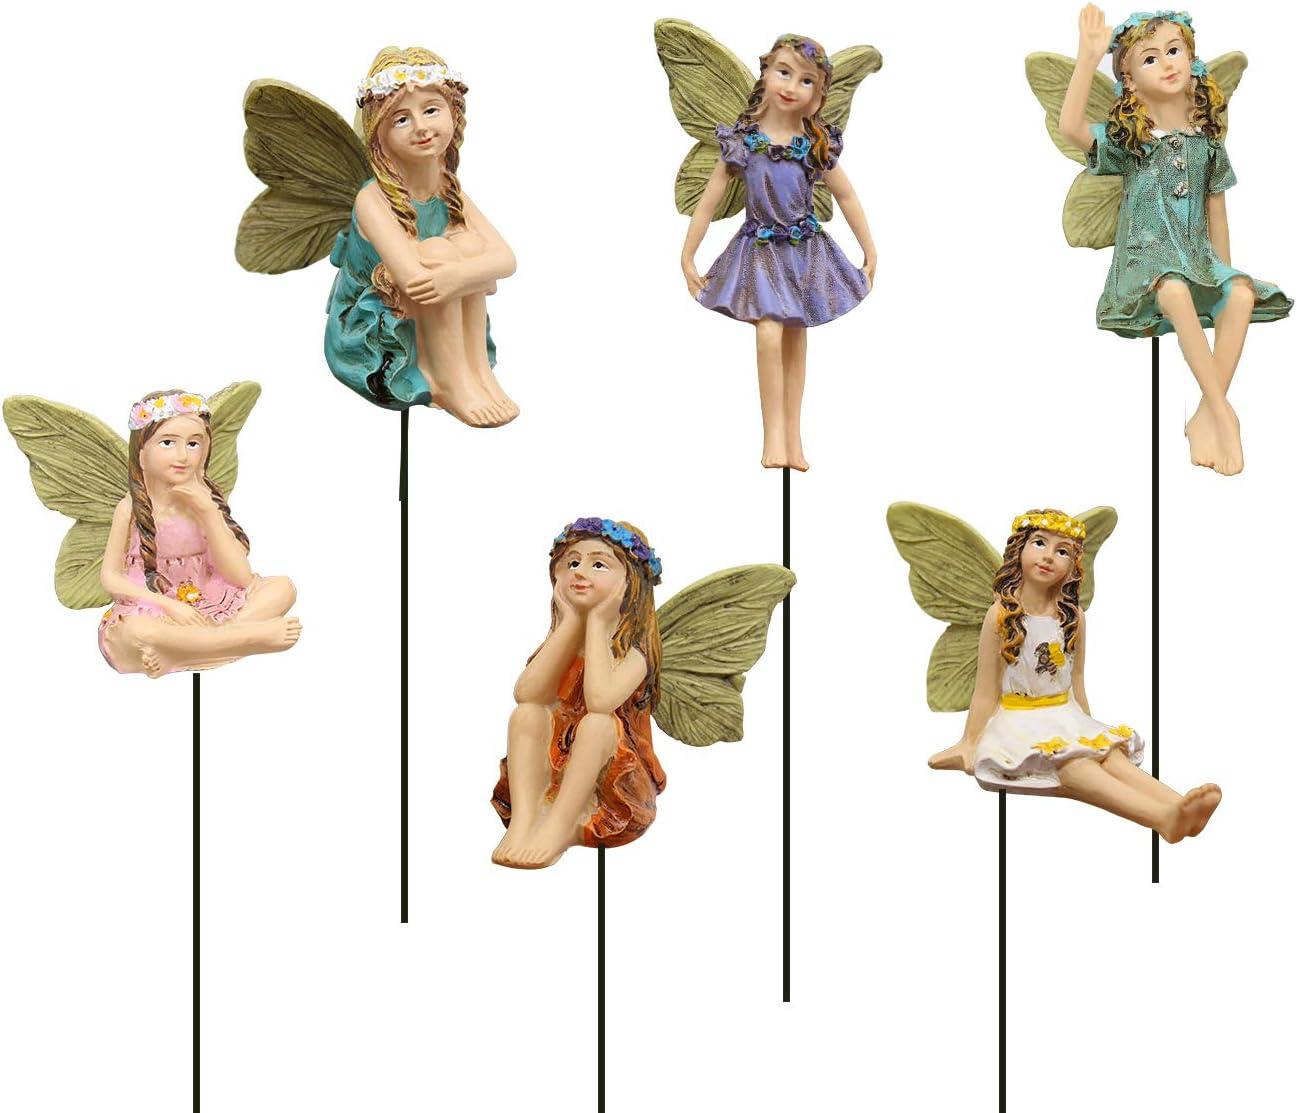 IFFUNNI Fairy Garden - Set of 6 pcs Miniature Fairies Figurines for Outdoor Garden Lawn Décor